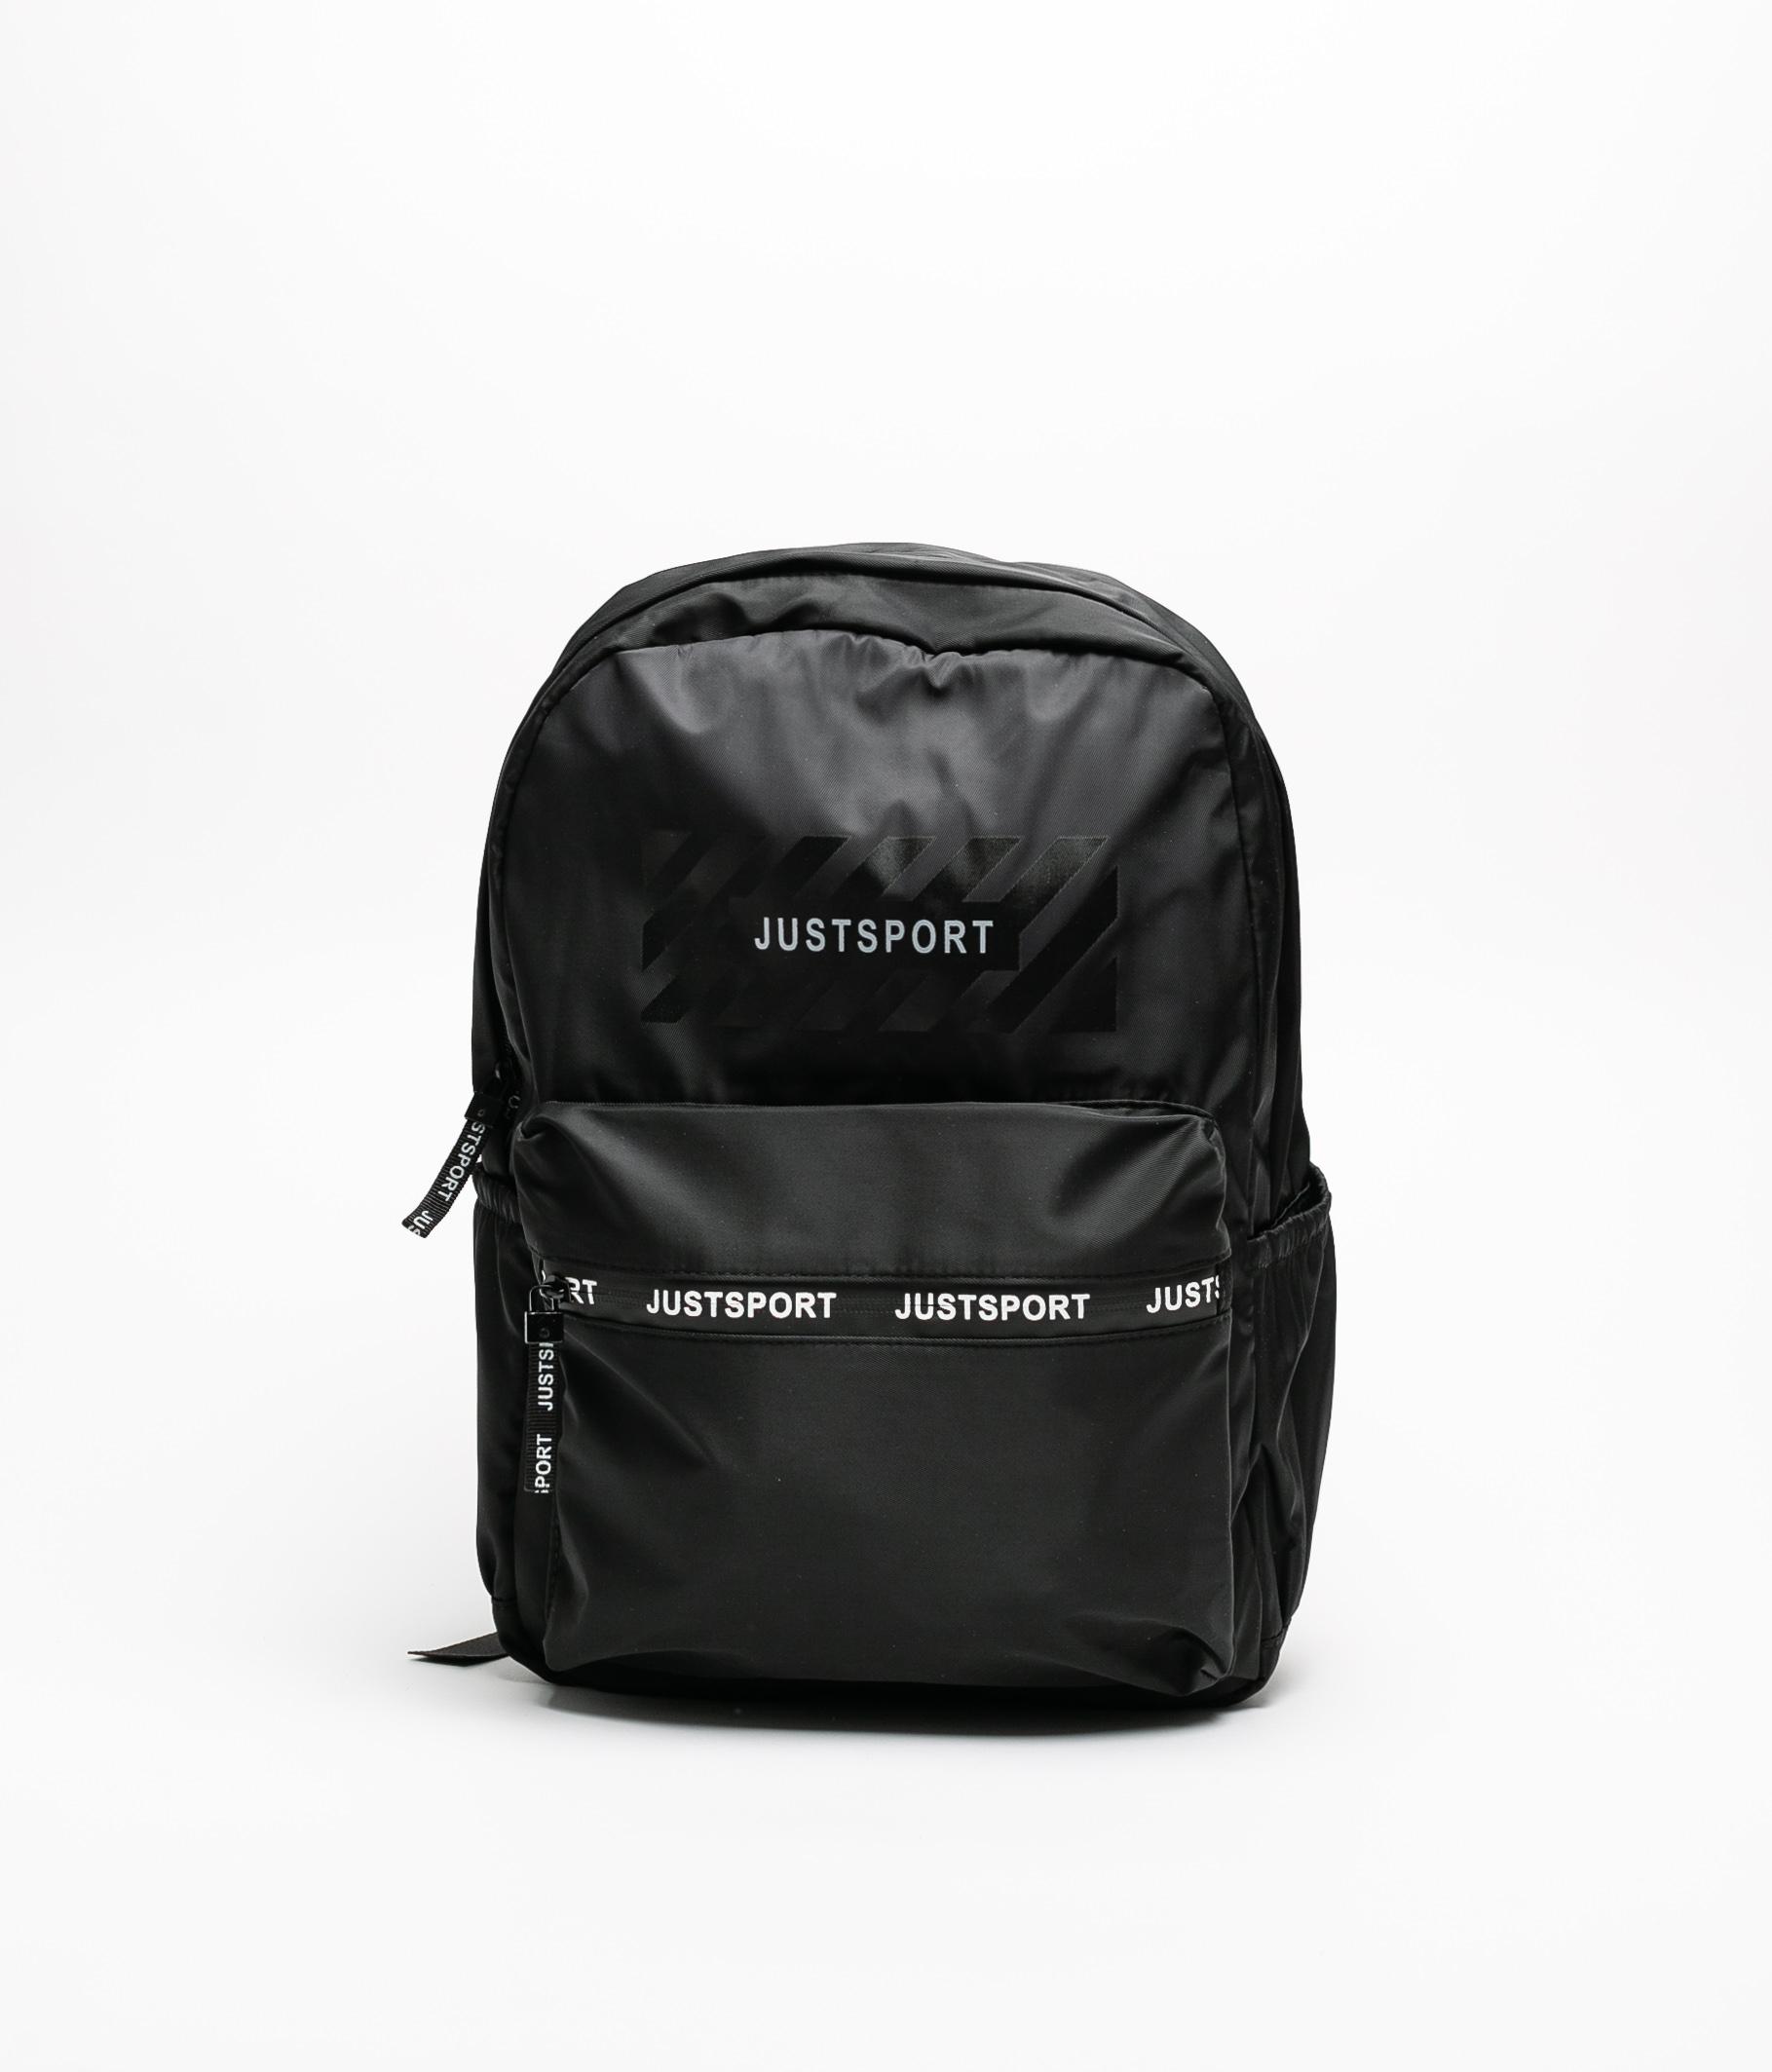 JUSTSPORT BAGPACK - BLACK